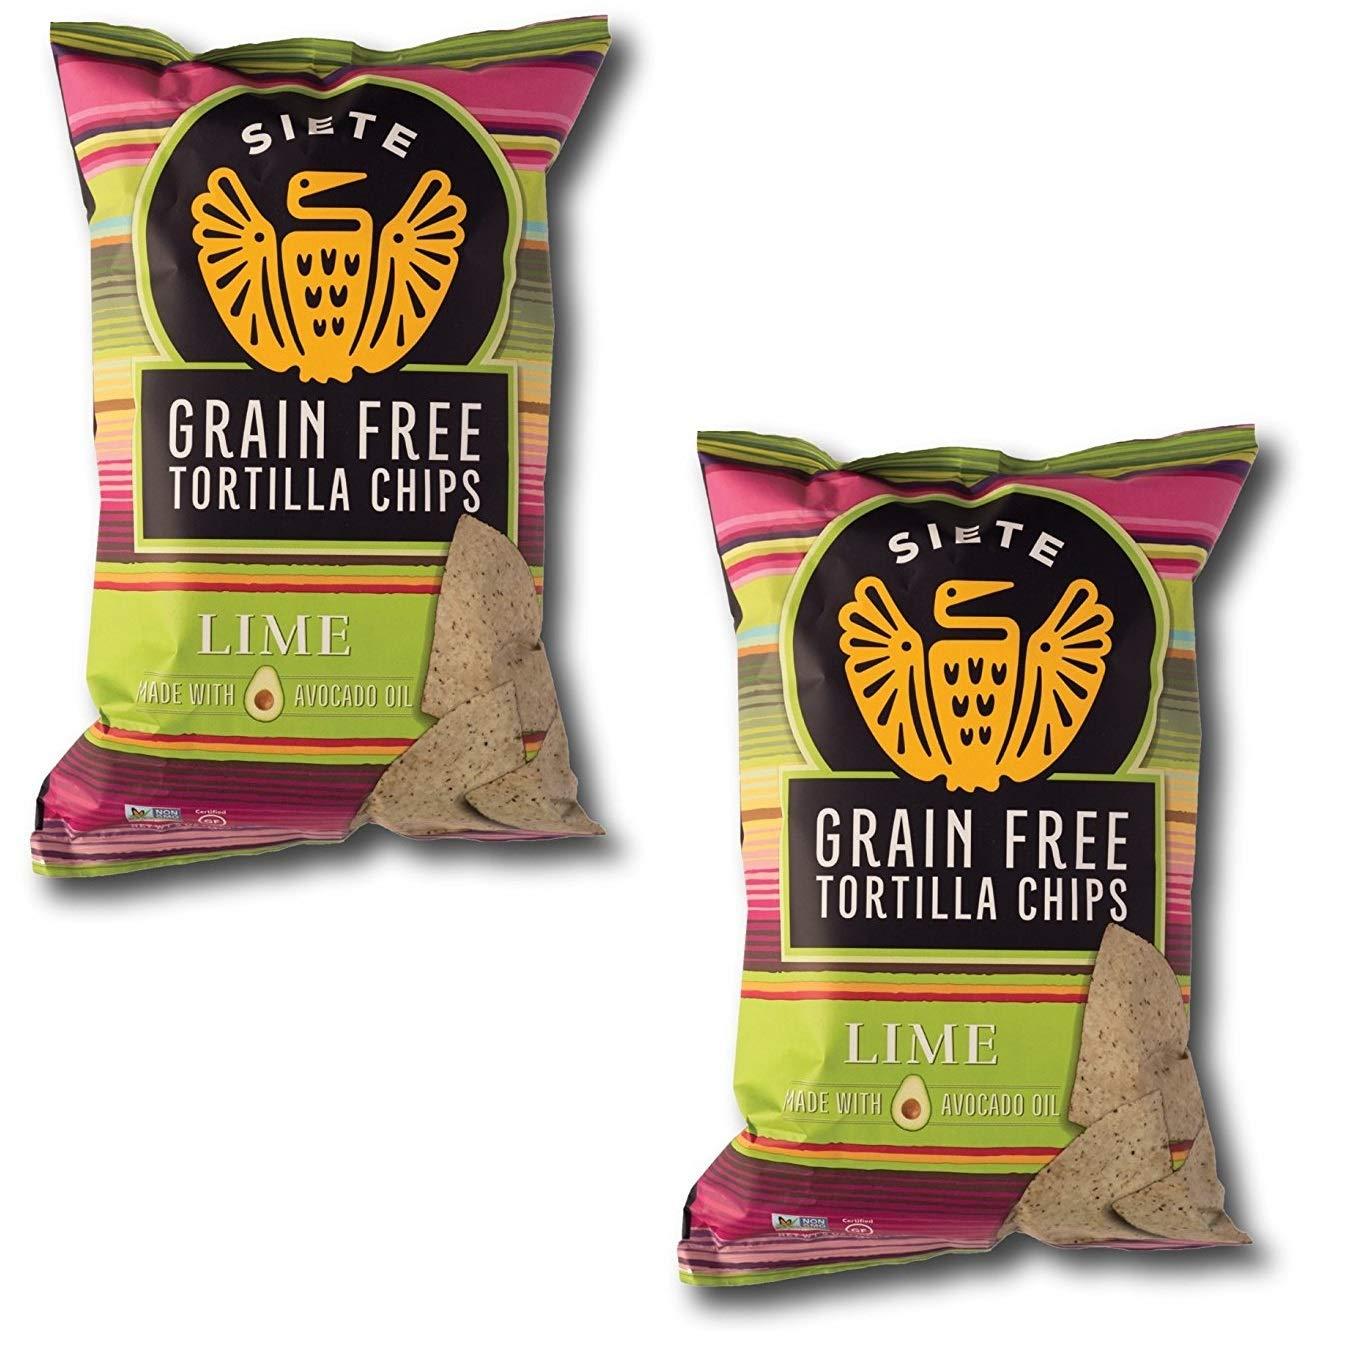 Siete Lime Grain Free Tortilla Chips, 5 oz bags, 2-Pack by Siete